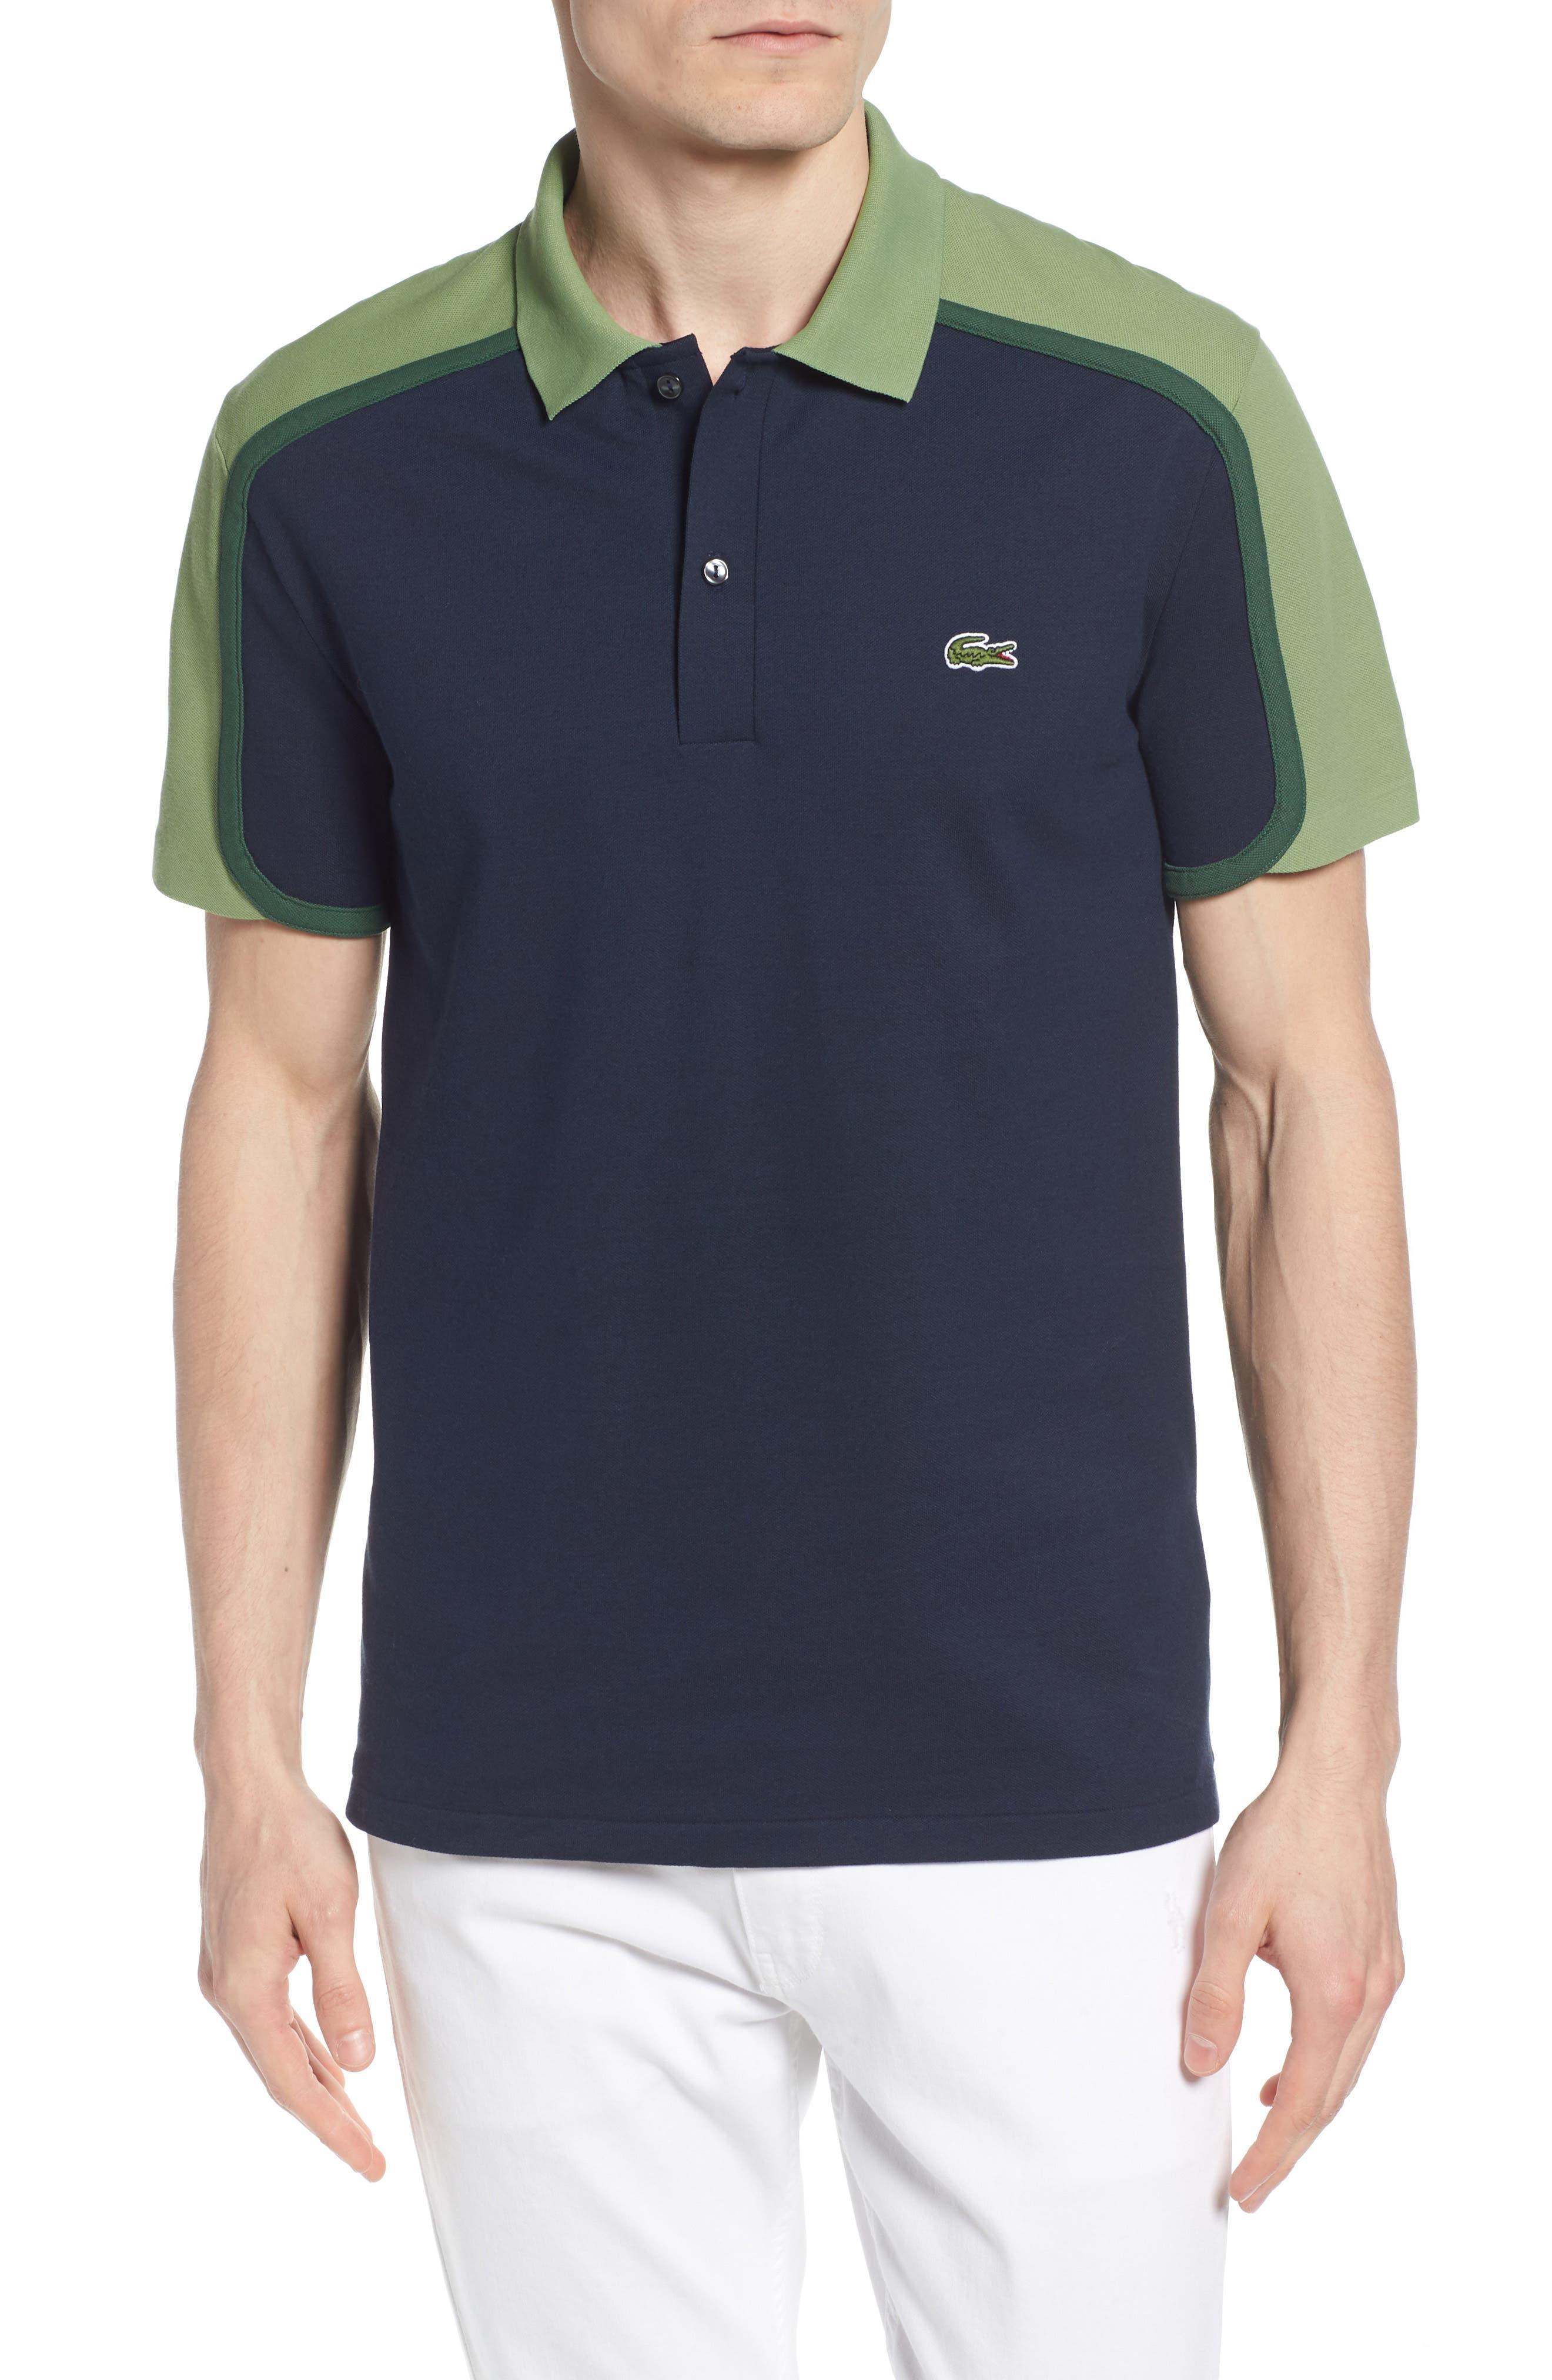 505855e5ee9a Lacoste Polo Shirt Price Singapore - BCD Tofu House